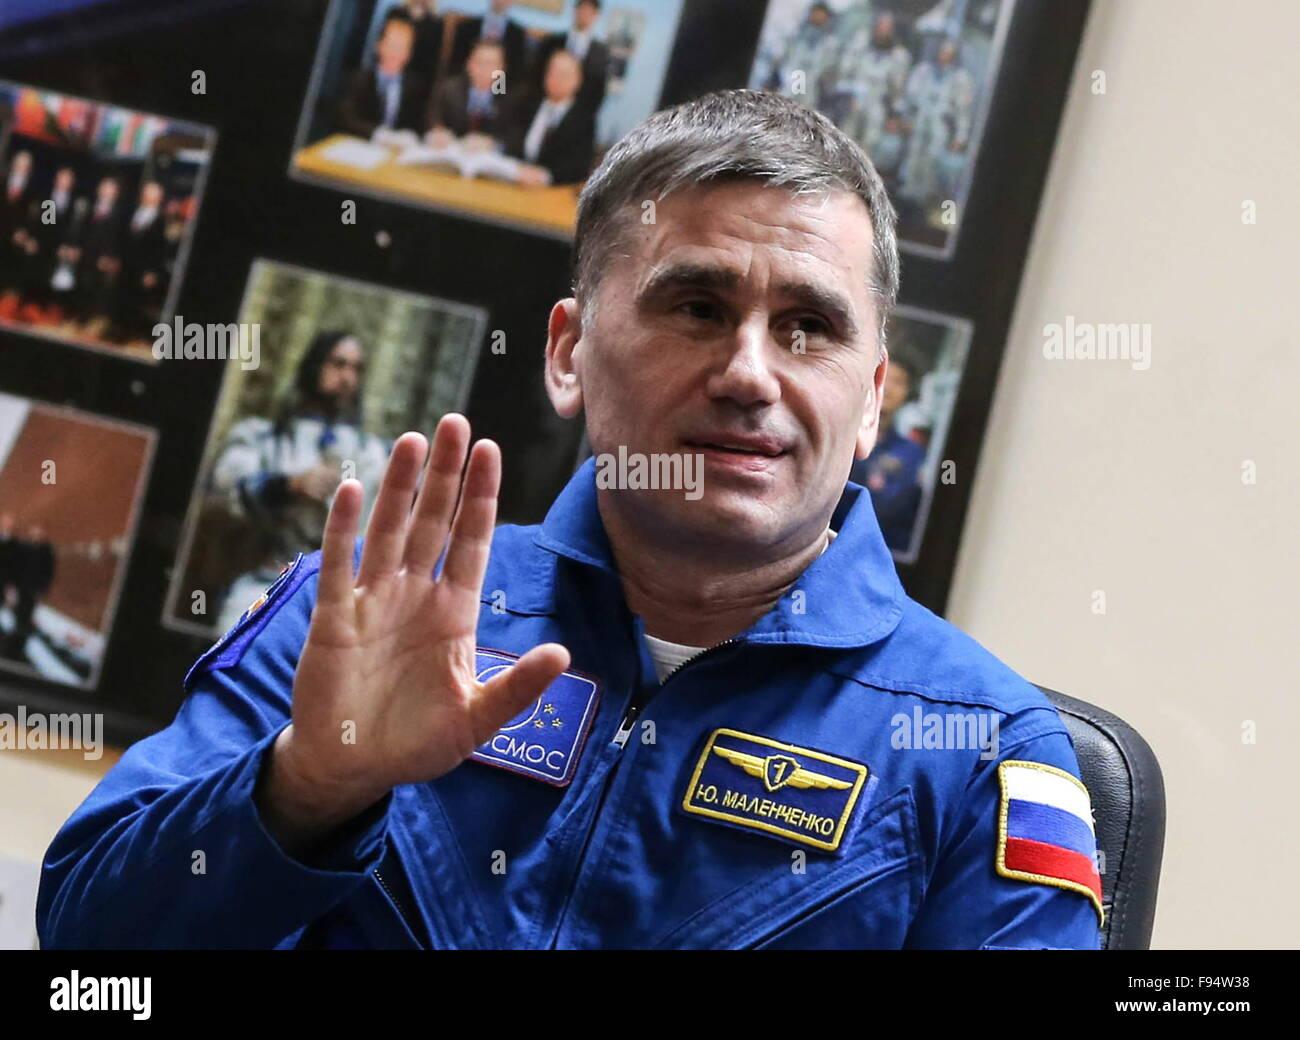 Baikonur, Kazakhstan. 14th Dec, 2015. ISS Expedition 47/46 crew member, Roscosmos cosmonaut Yuri Malenchenko of - Stock Image